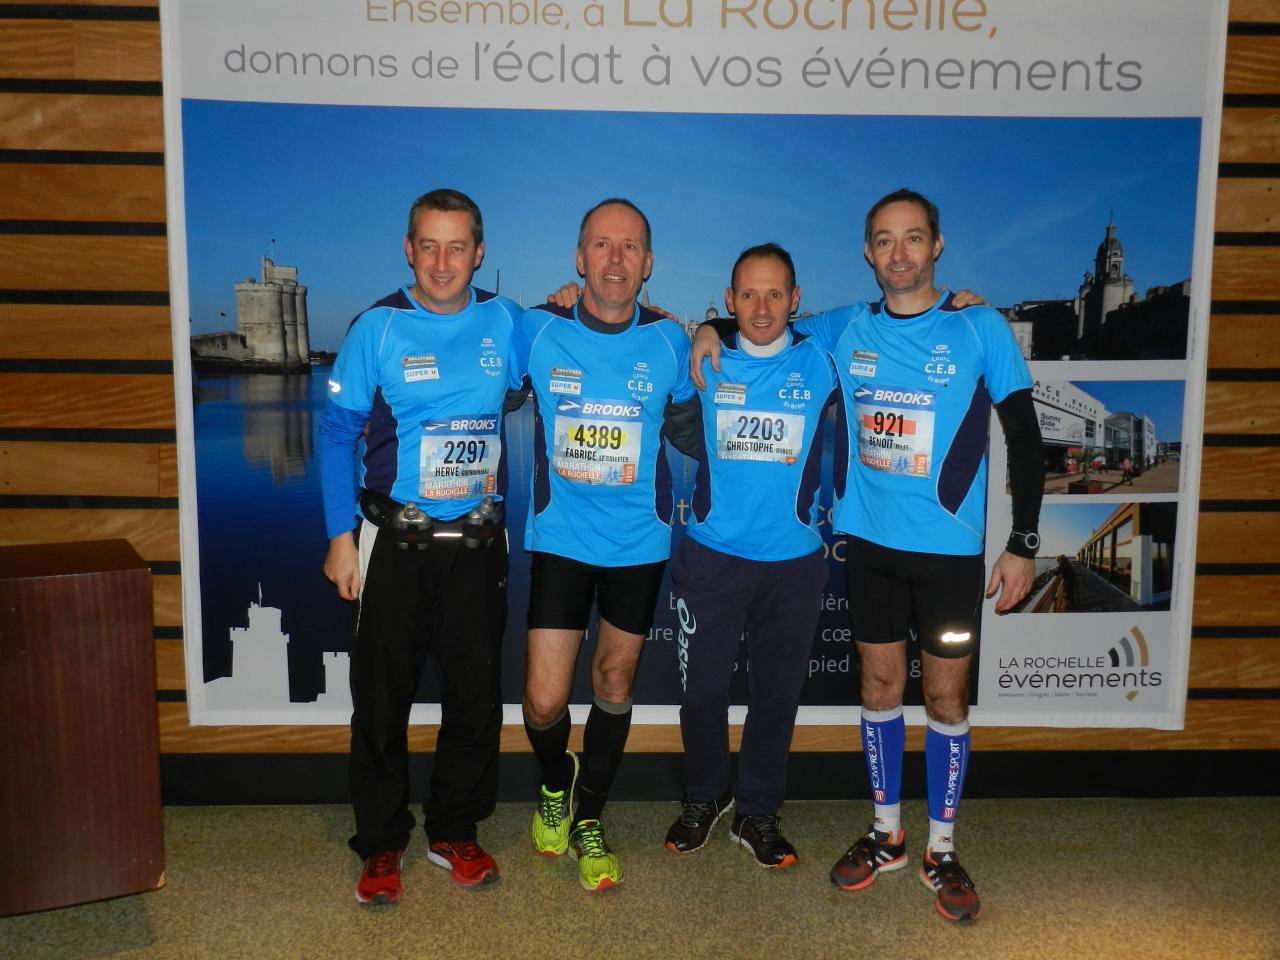 27 novembre 2016 : Marathon de La Rochelle